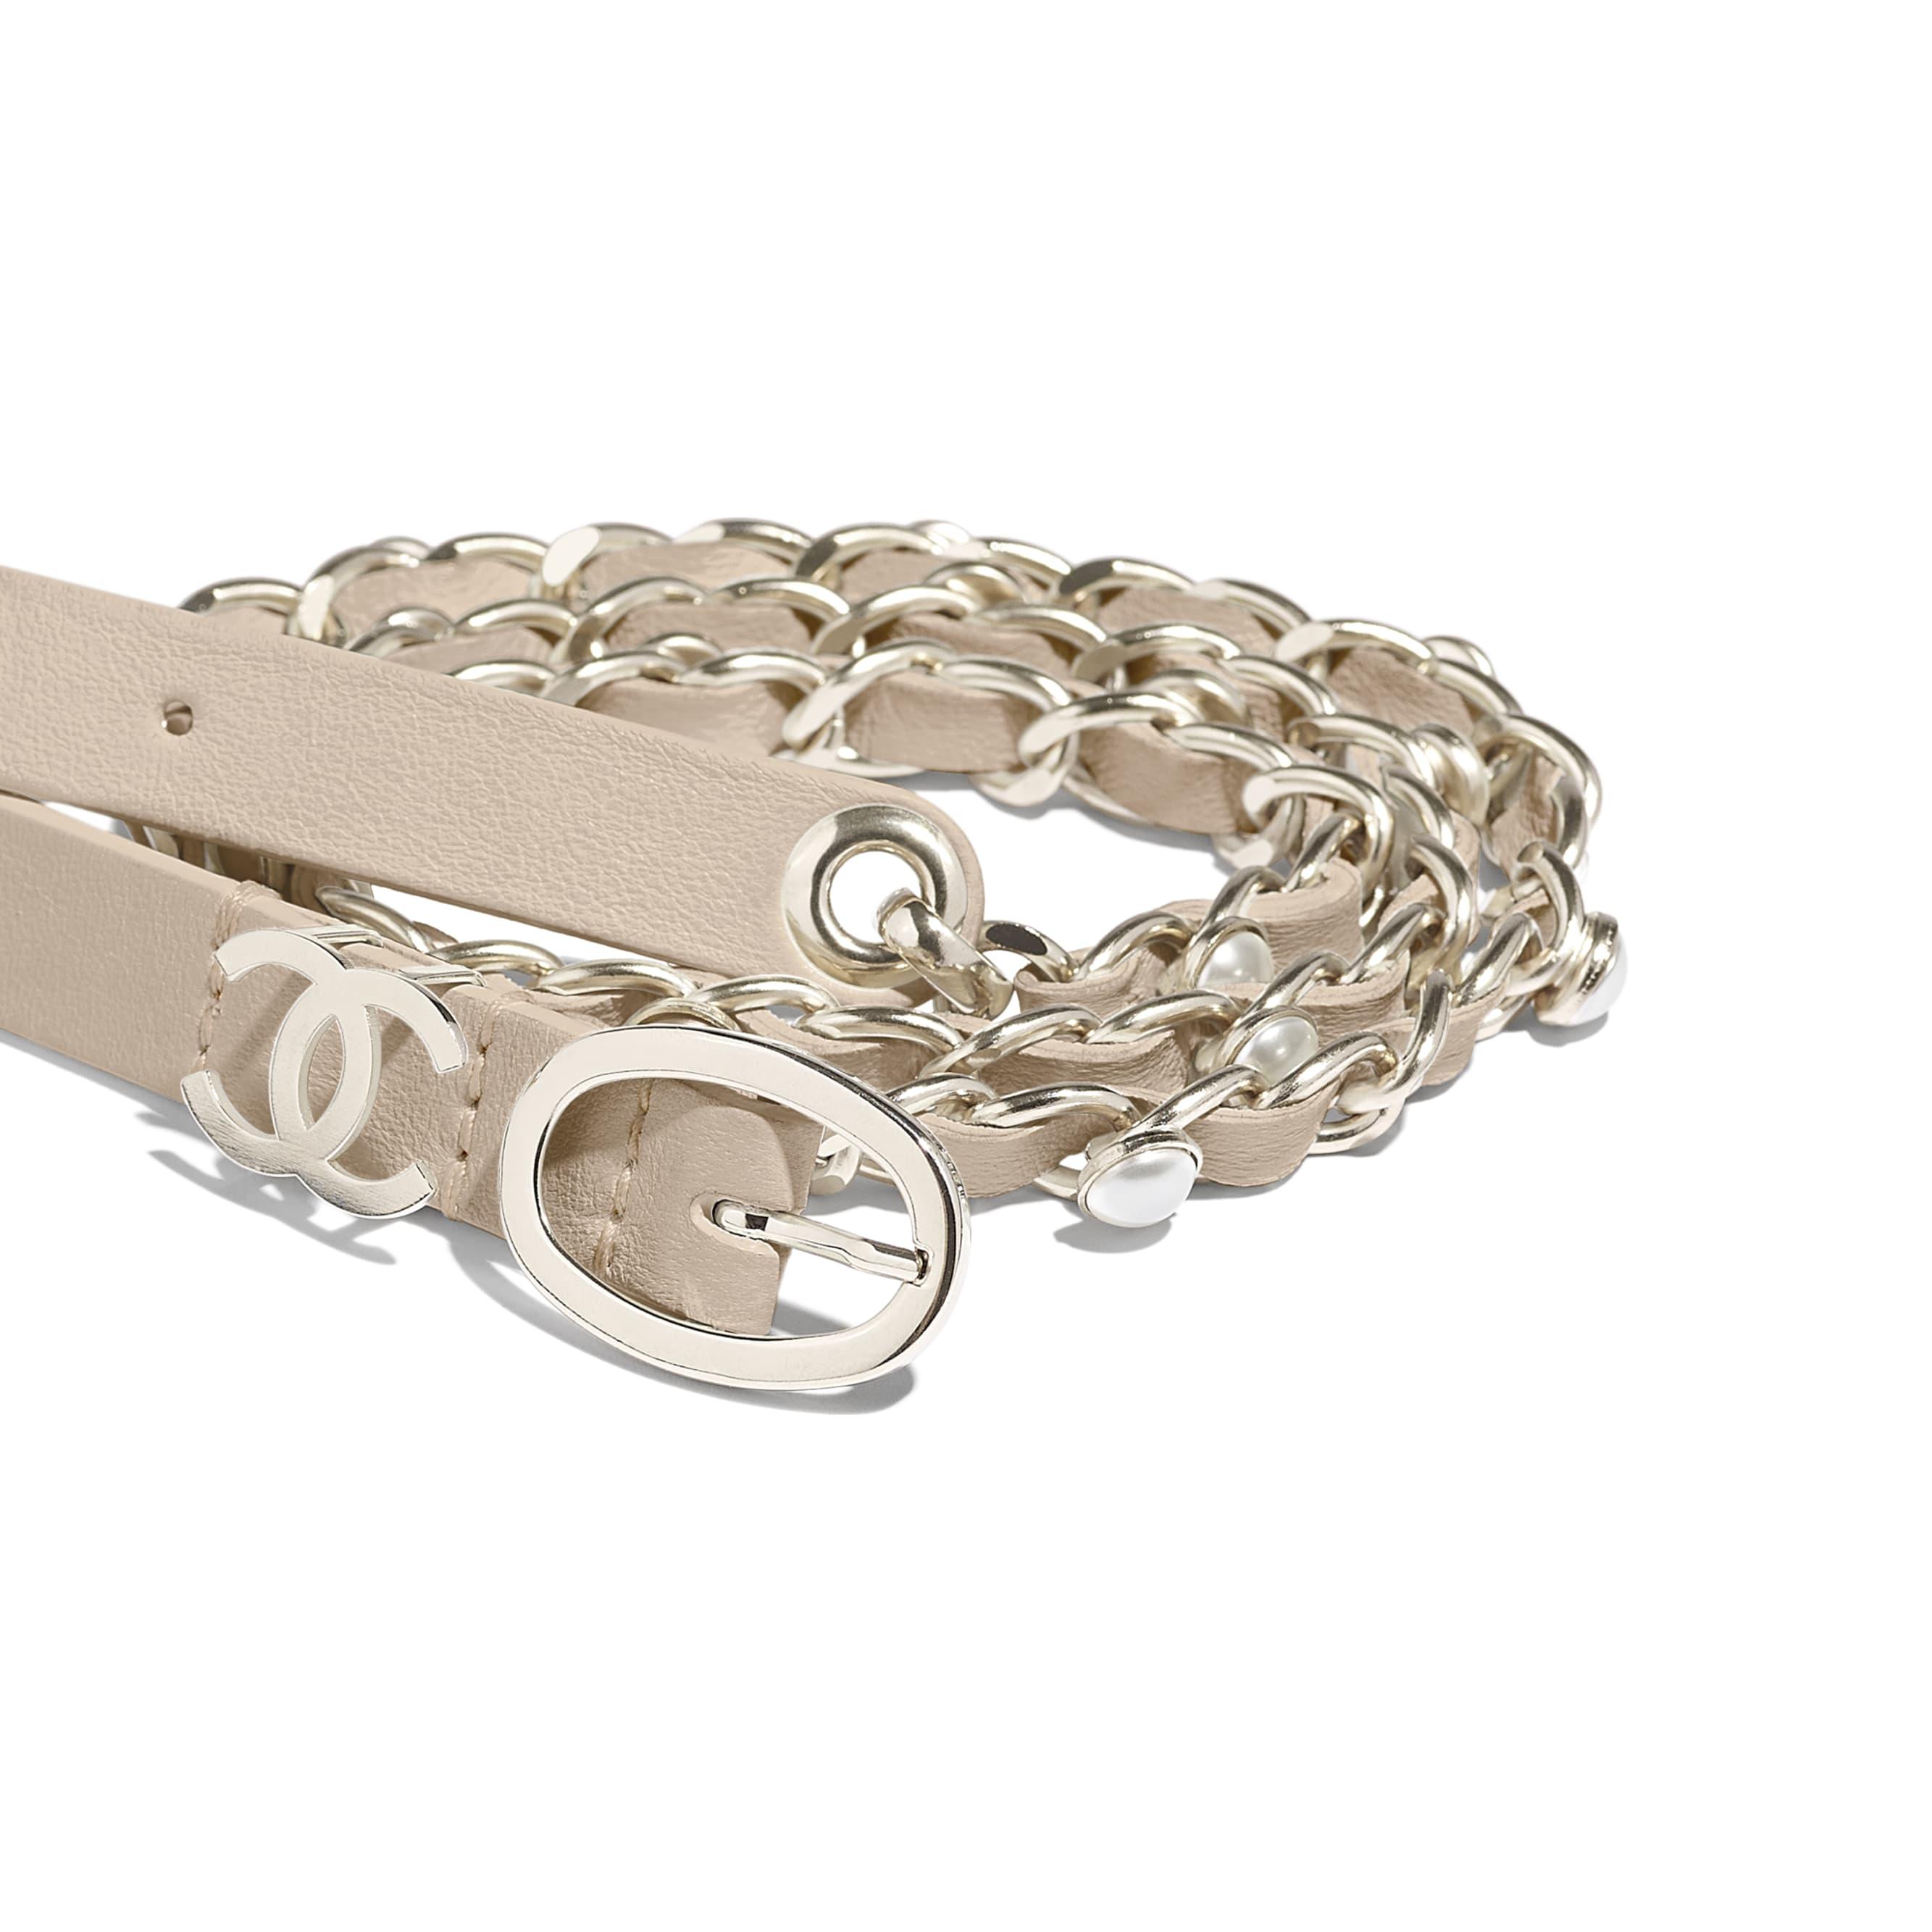 Belt - Beige - Lambskin, Gold-Tone Metal & Glass Pearls - Alternative view - see standard sized version